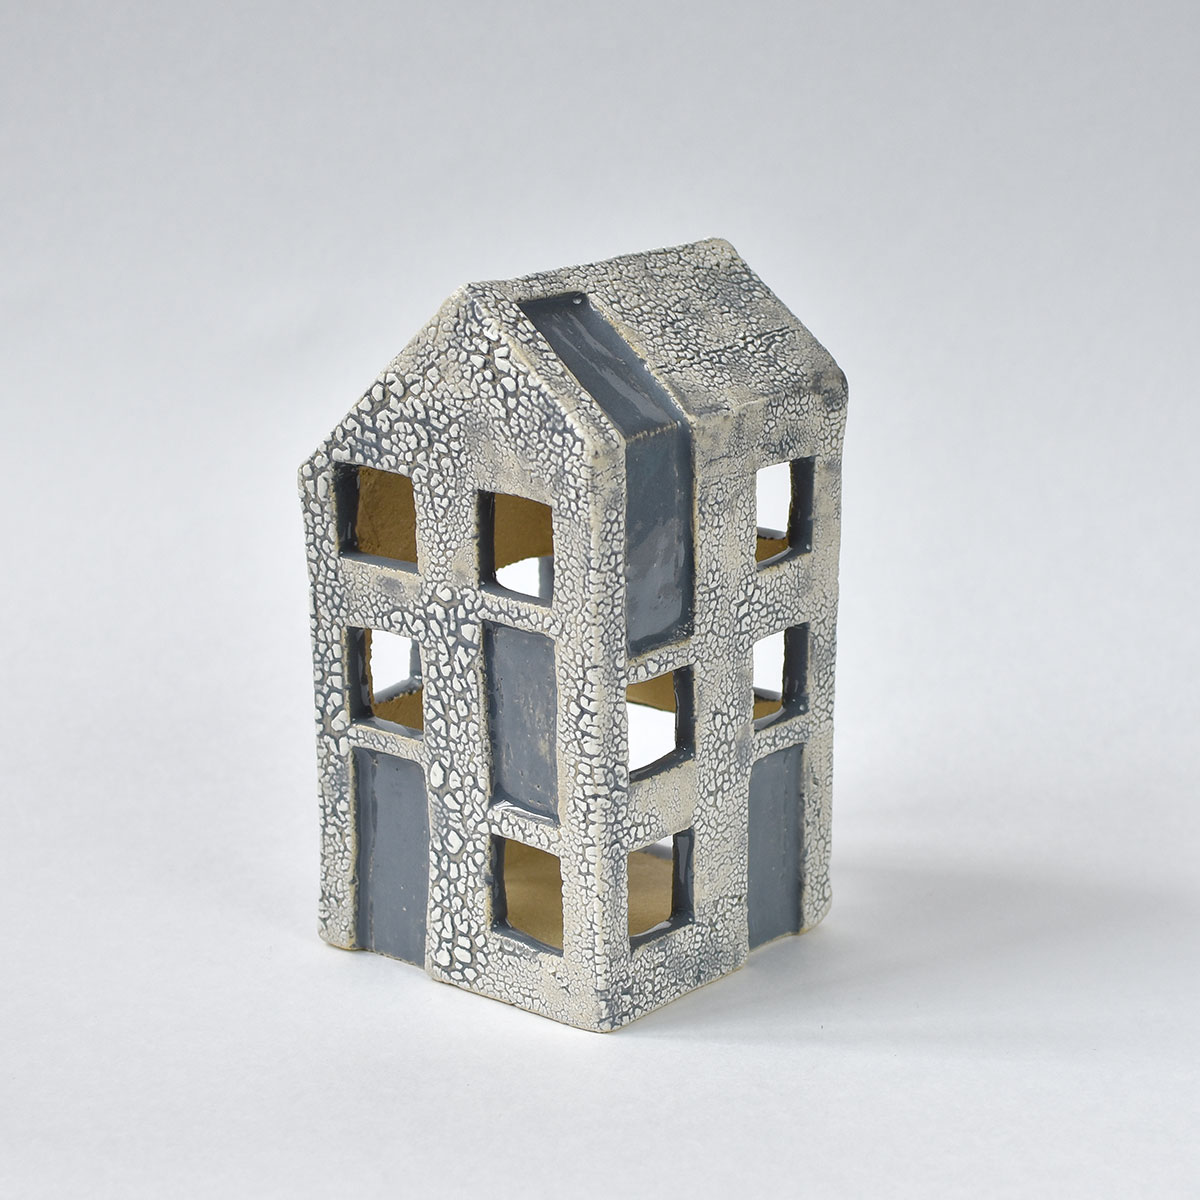 "картинка Керамический домик-подсвечник ""Дерево"" - DishWishes.Ru"